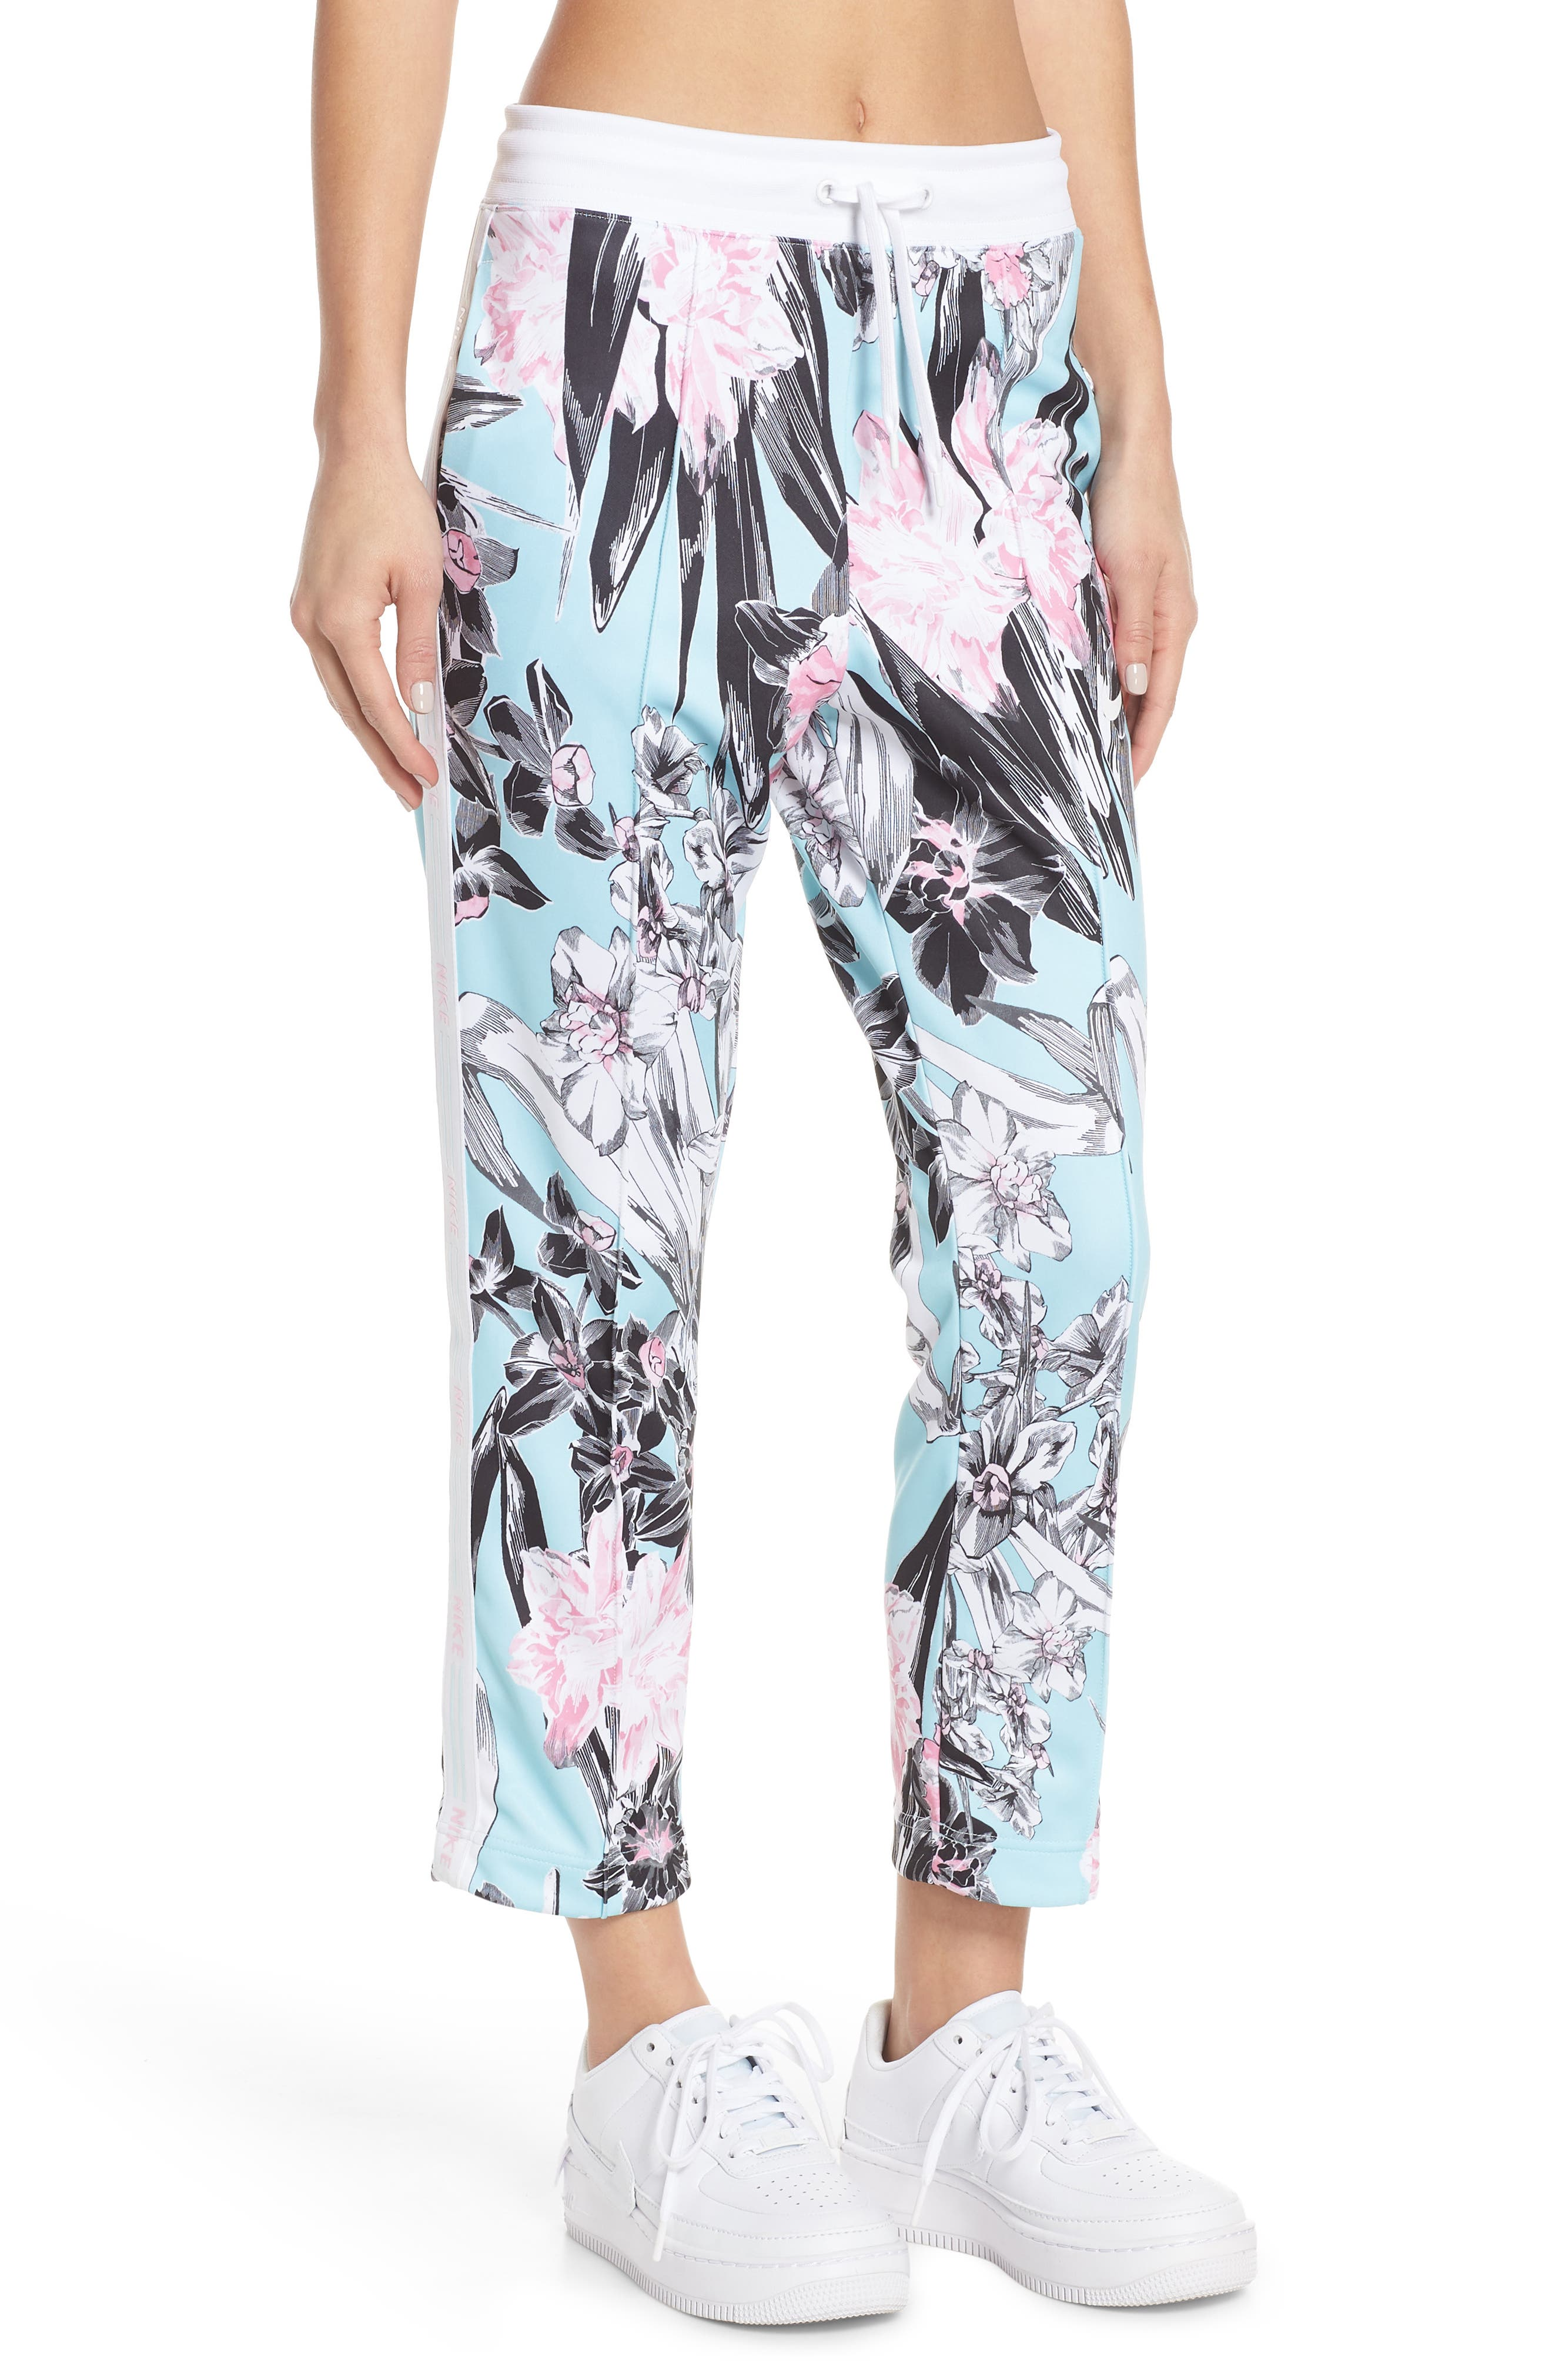 NIKE, Sportswear Floral Print Pants, Main thumbnail 1, color, TOPAZ MIST/ WHITE/ WHITE